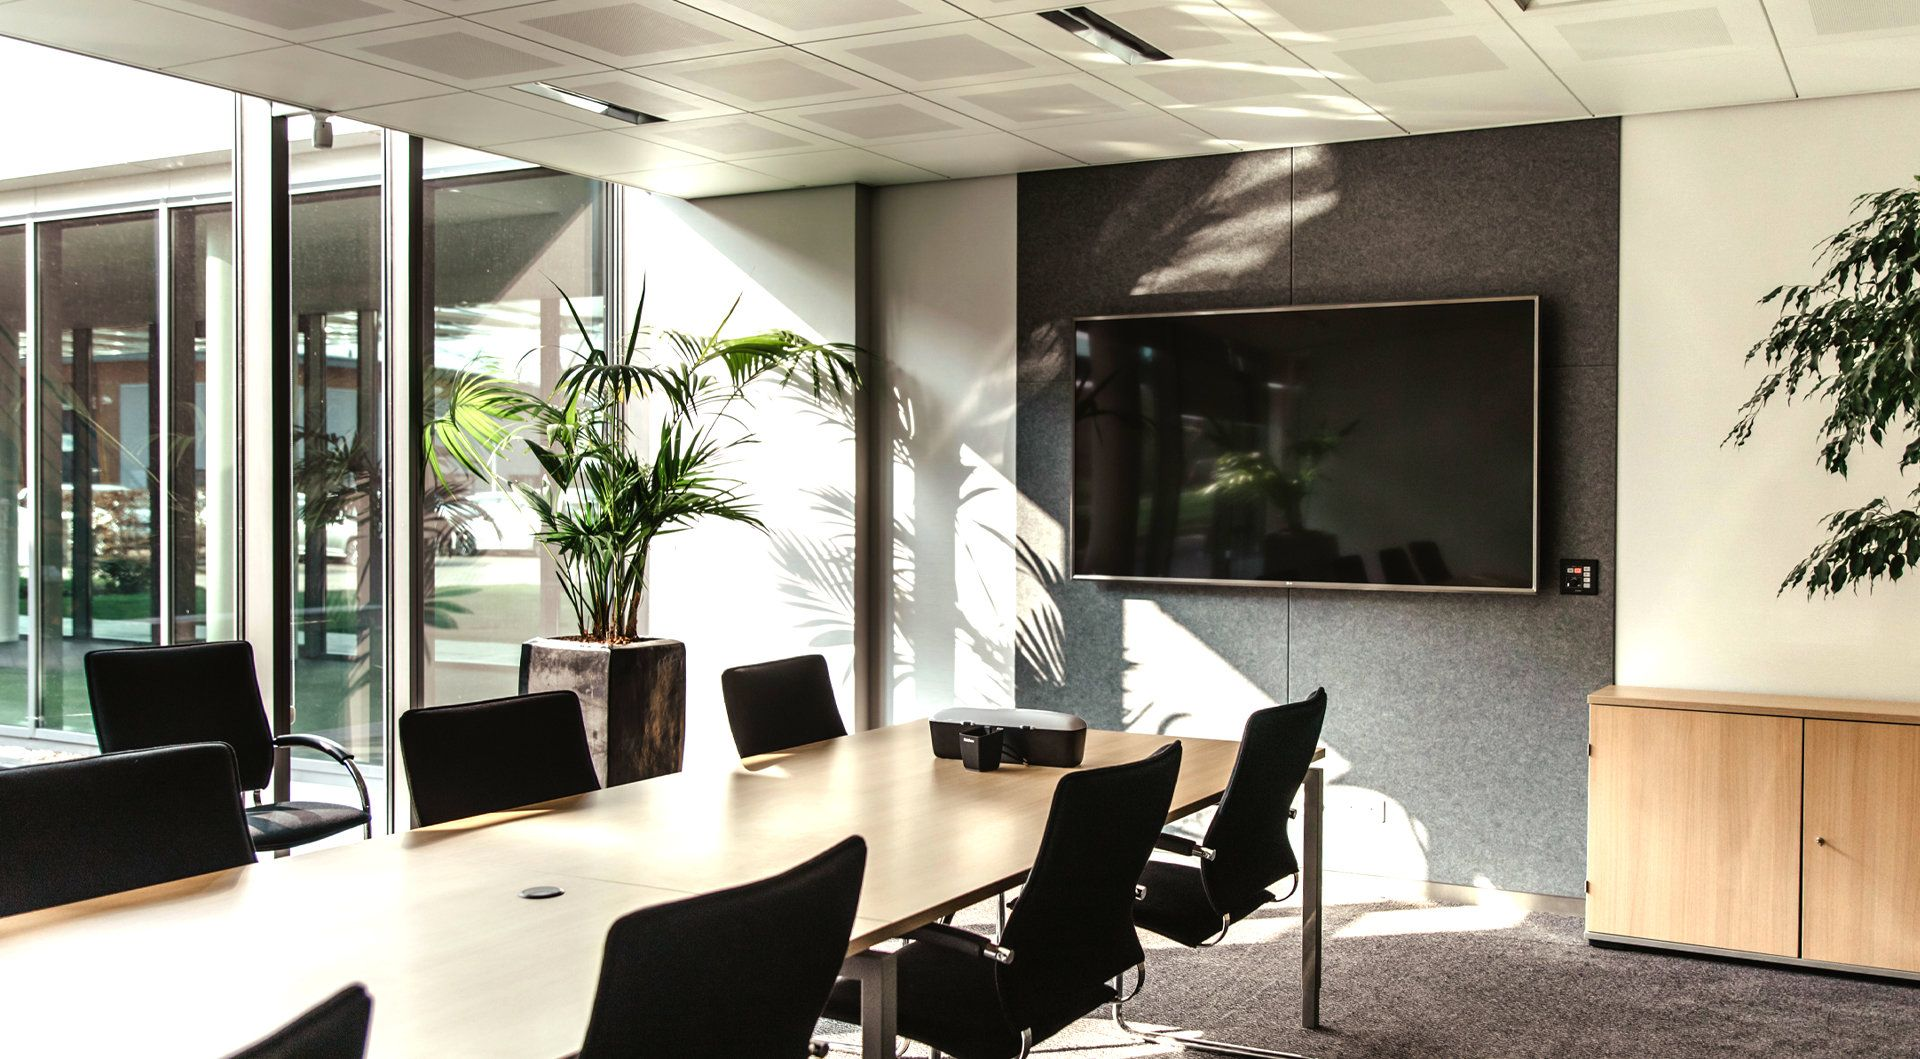 "Chief PF1UB flat panel vloer standaard 2,18 m (86"") Vaste flatscreen vloerstandaard Zwart - Case studie de vries"